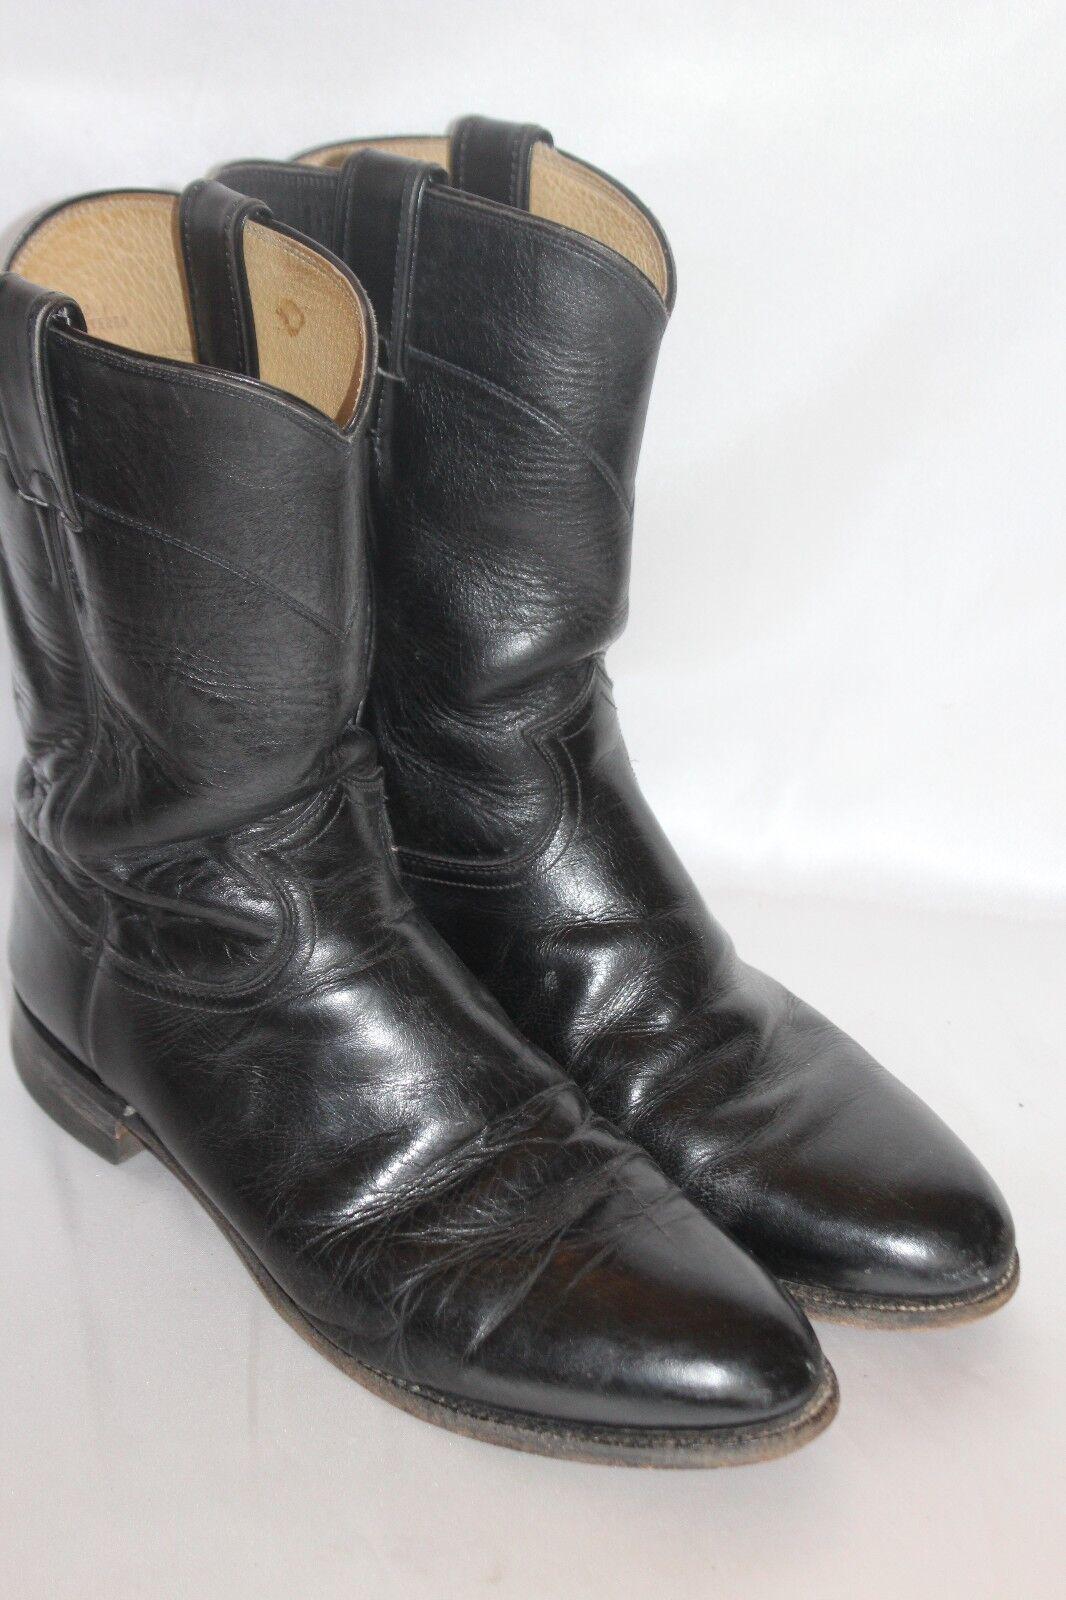 Mens JUSTIN Black Leather ROPER Vintage Western Low Heel Riding Boots Sz 9.5 D